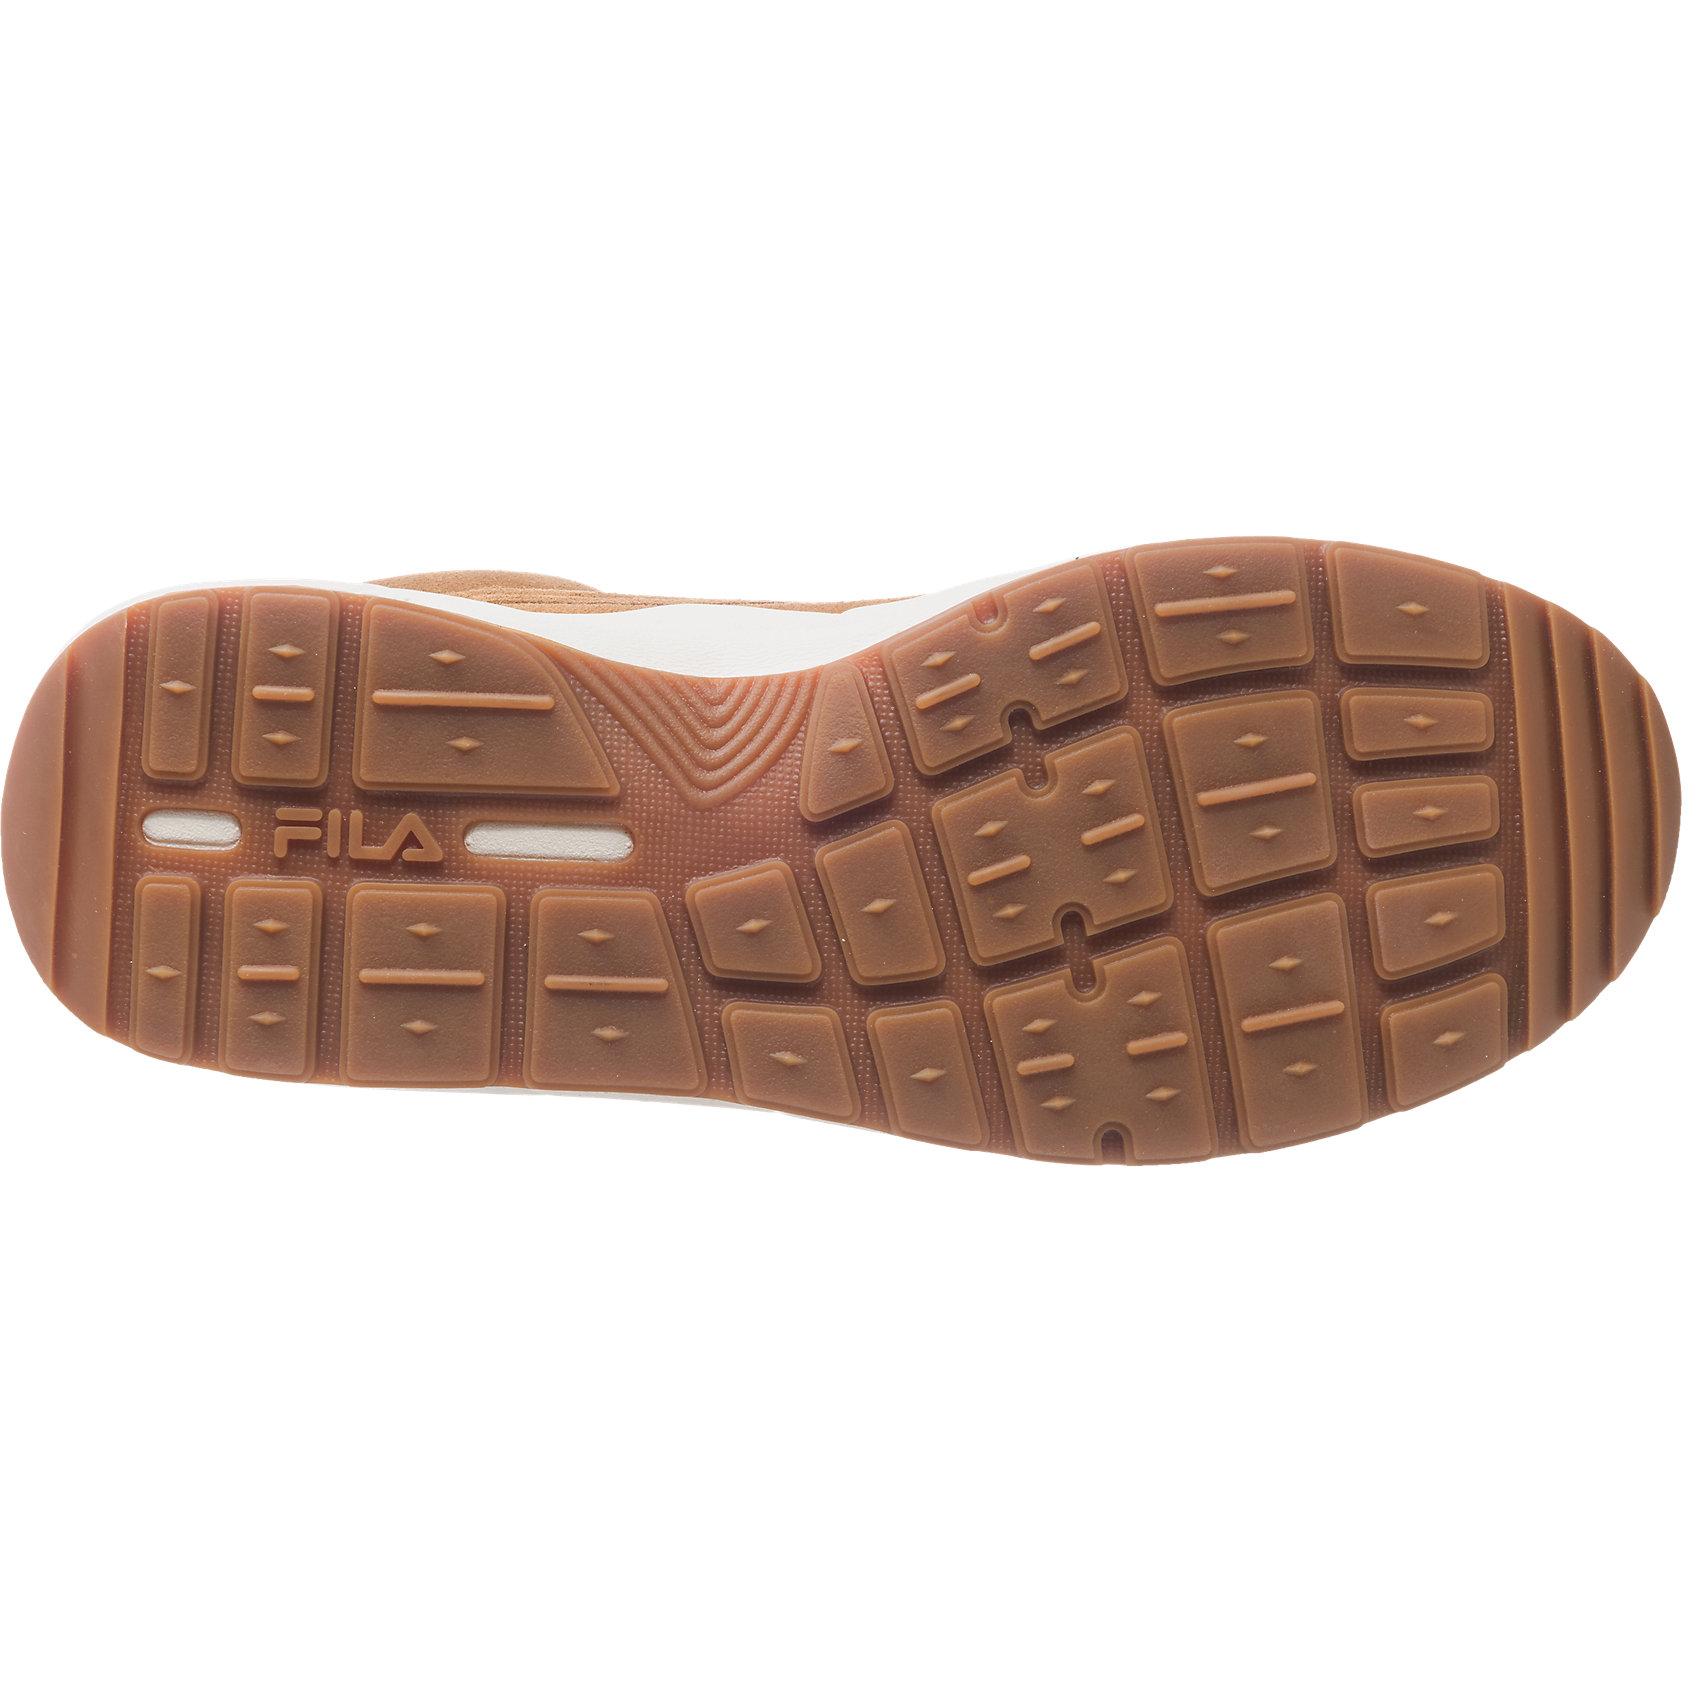 Neu-FILA-Boulder-Sneakers-6912589-fuer-Herren-camel